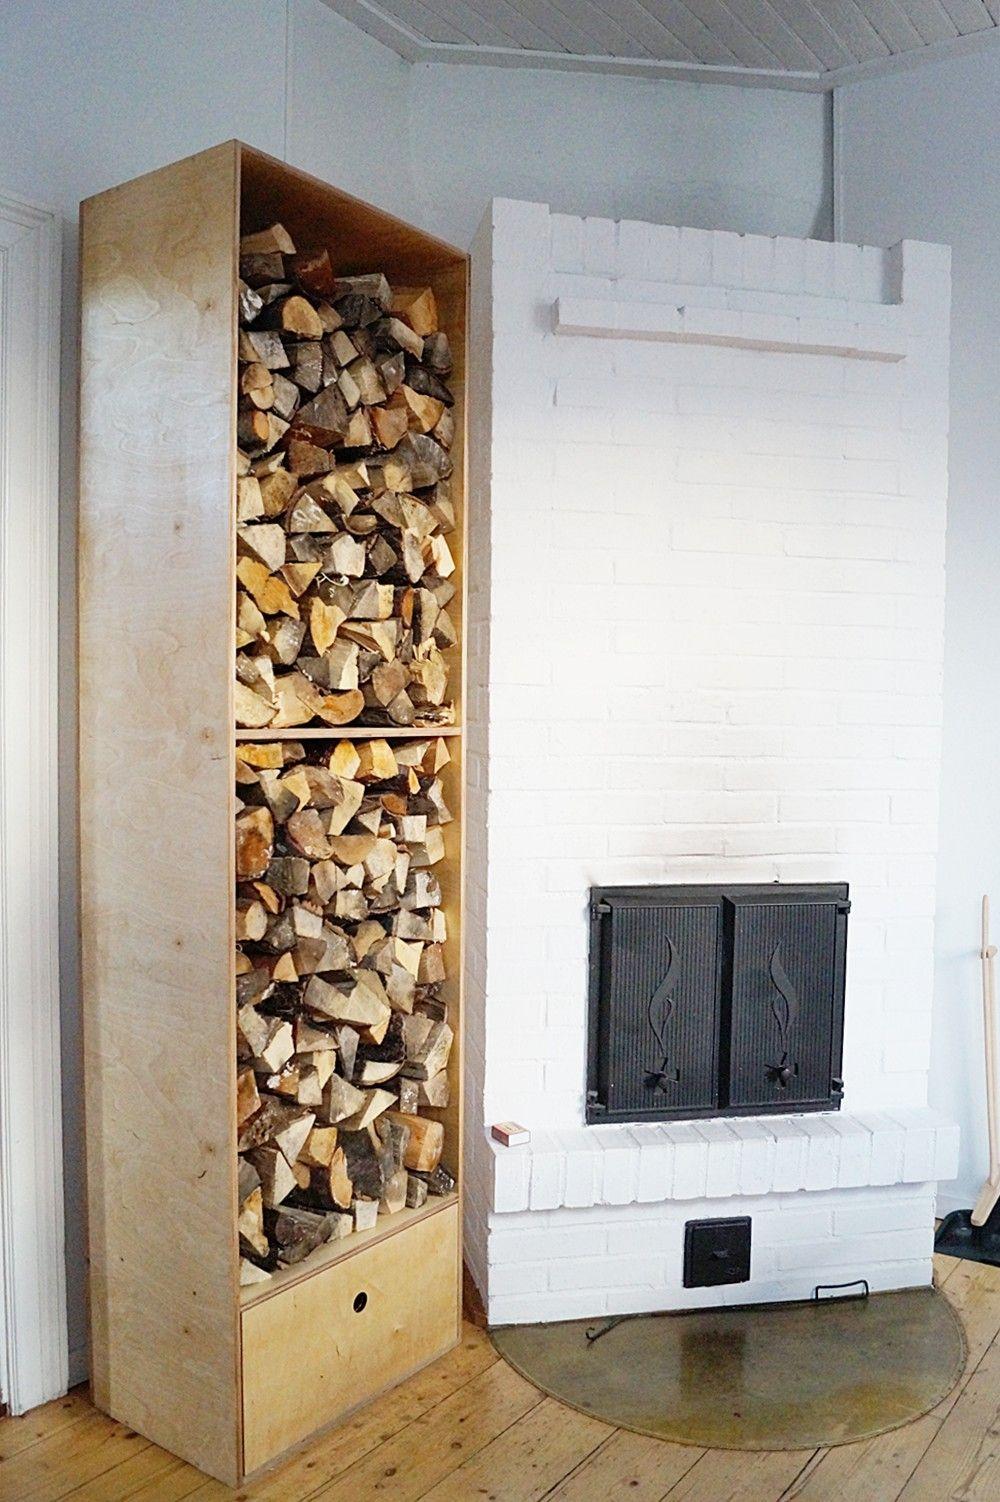 woodholder, diy, dining room, vaneri, plywood, klapikaappi, puun säilytys, puuteline, tee itse, ruokailuhuone, fireplace, takka, old house, vanha talo